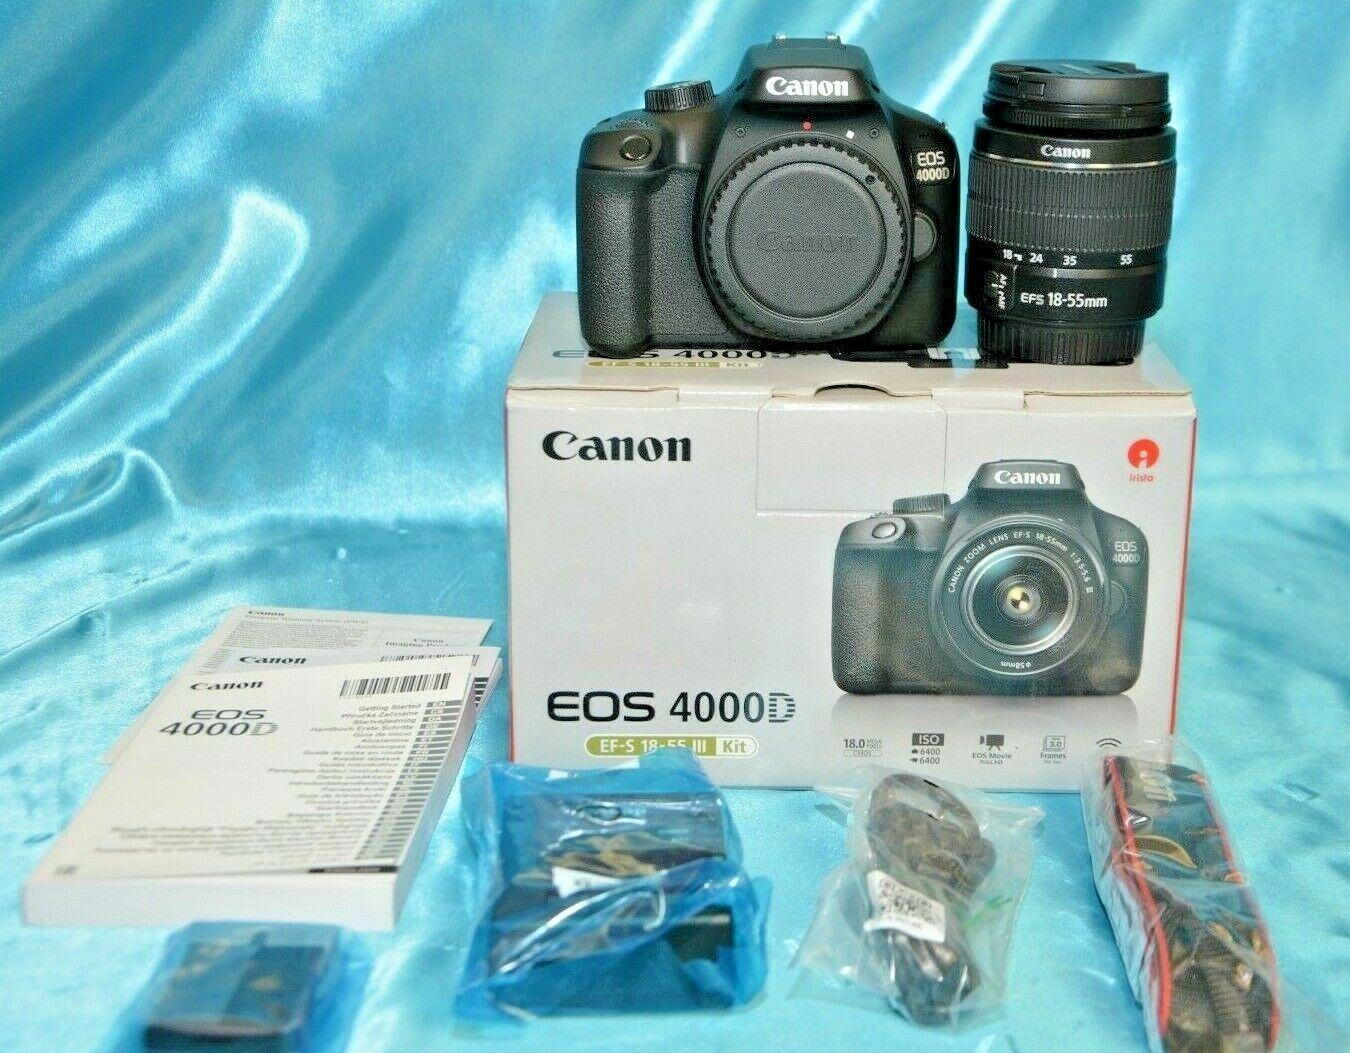 Canon EOS 4000D EF-S 18-55mm DC III Kit Spiegelreflexkamera, Schwarz